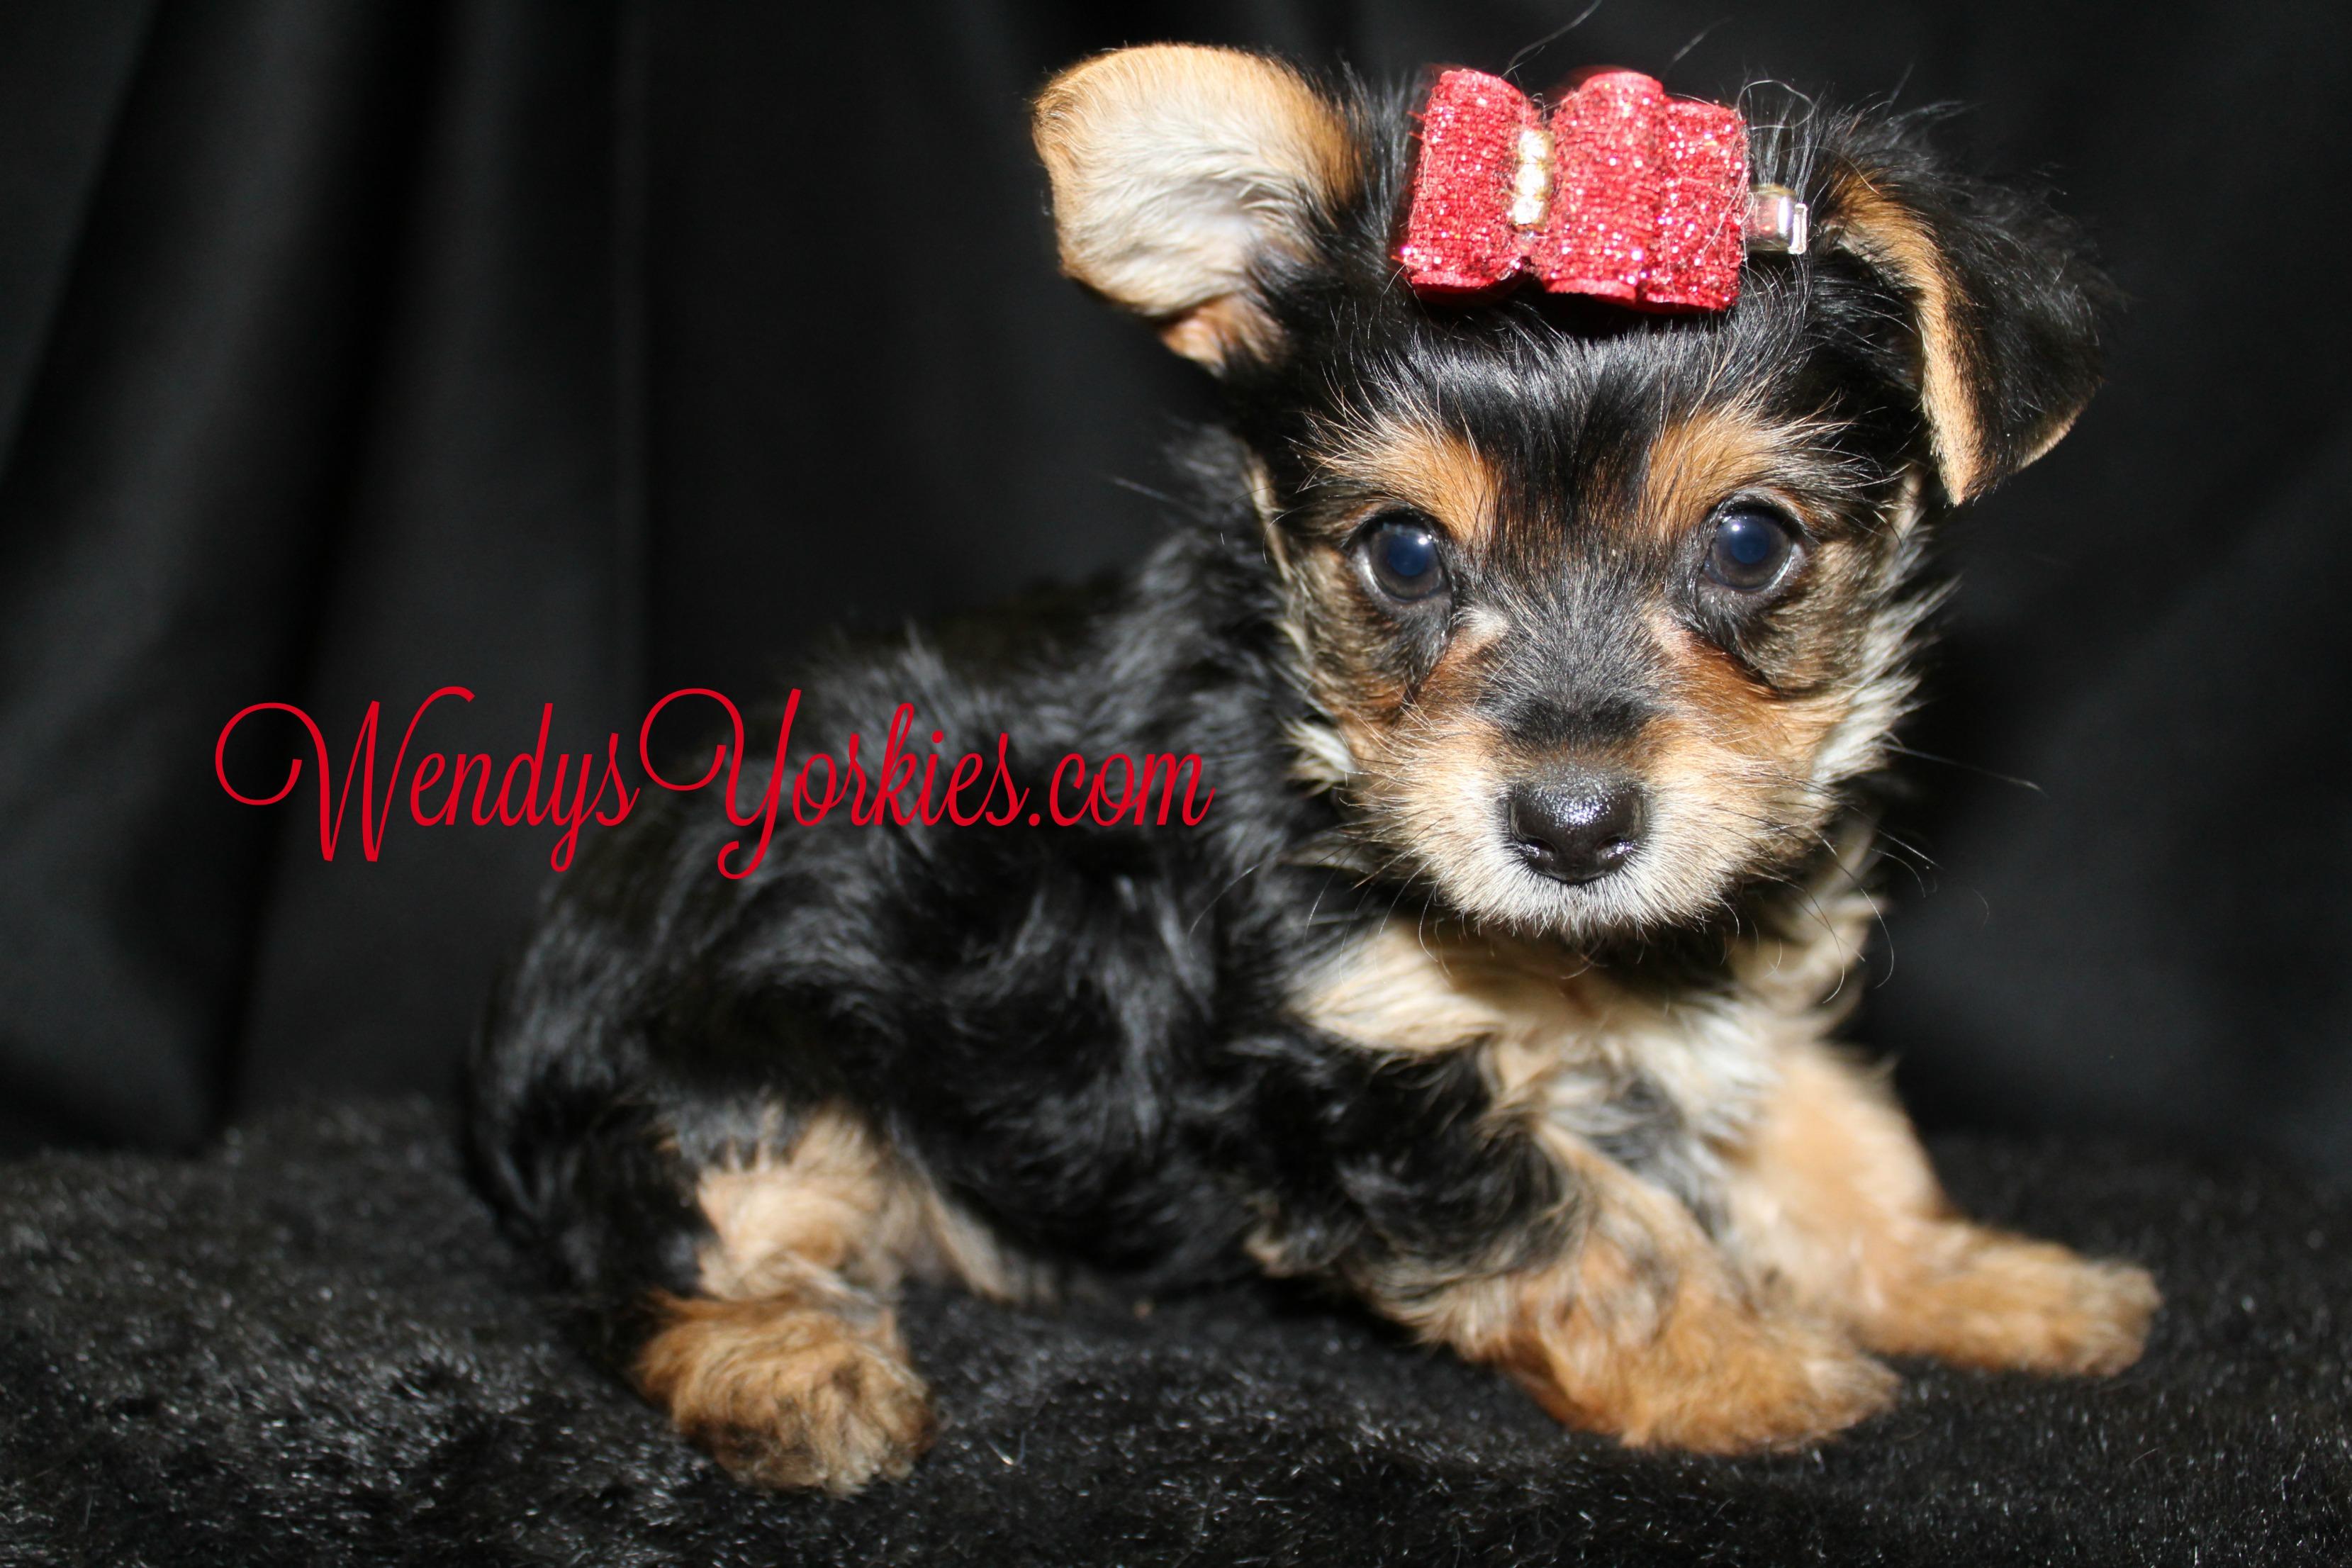 Female Yorkie puppy for sale, WendysYorkies.com, TH f1